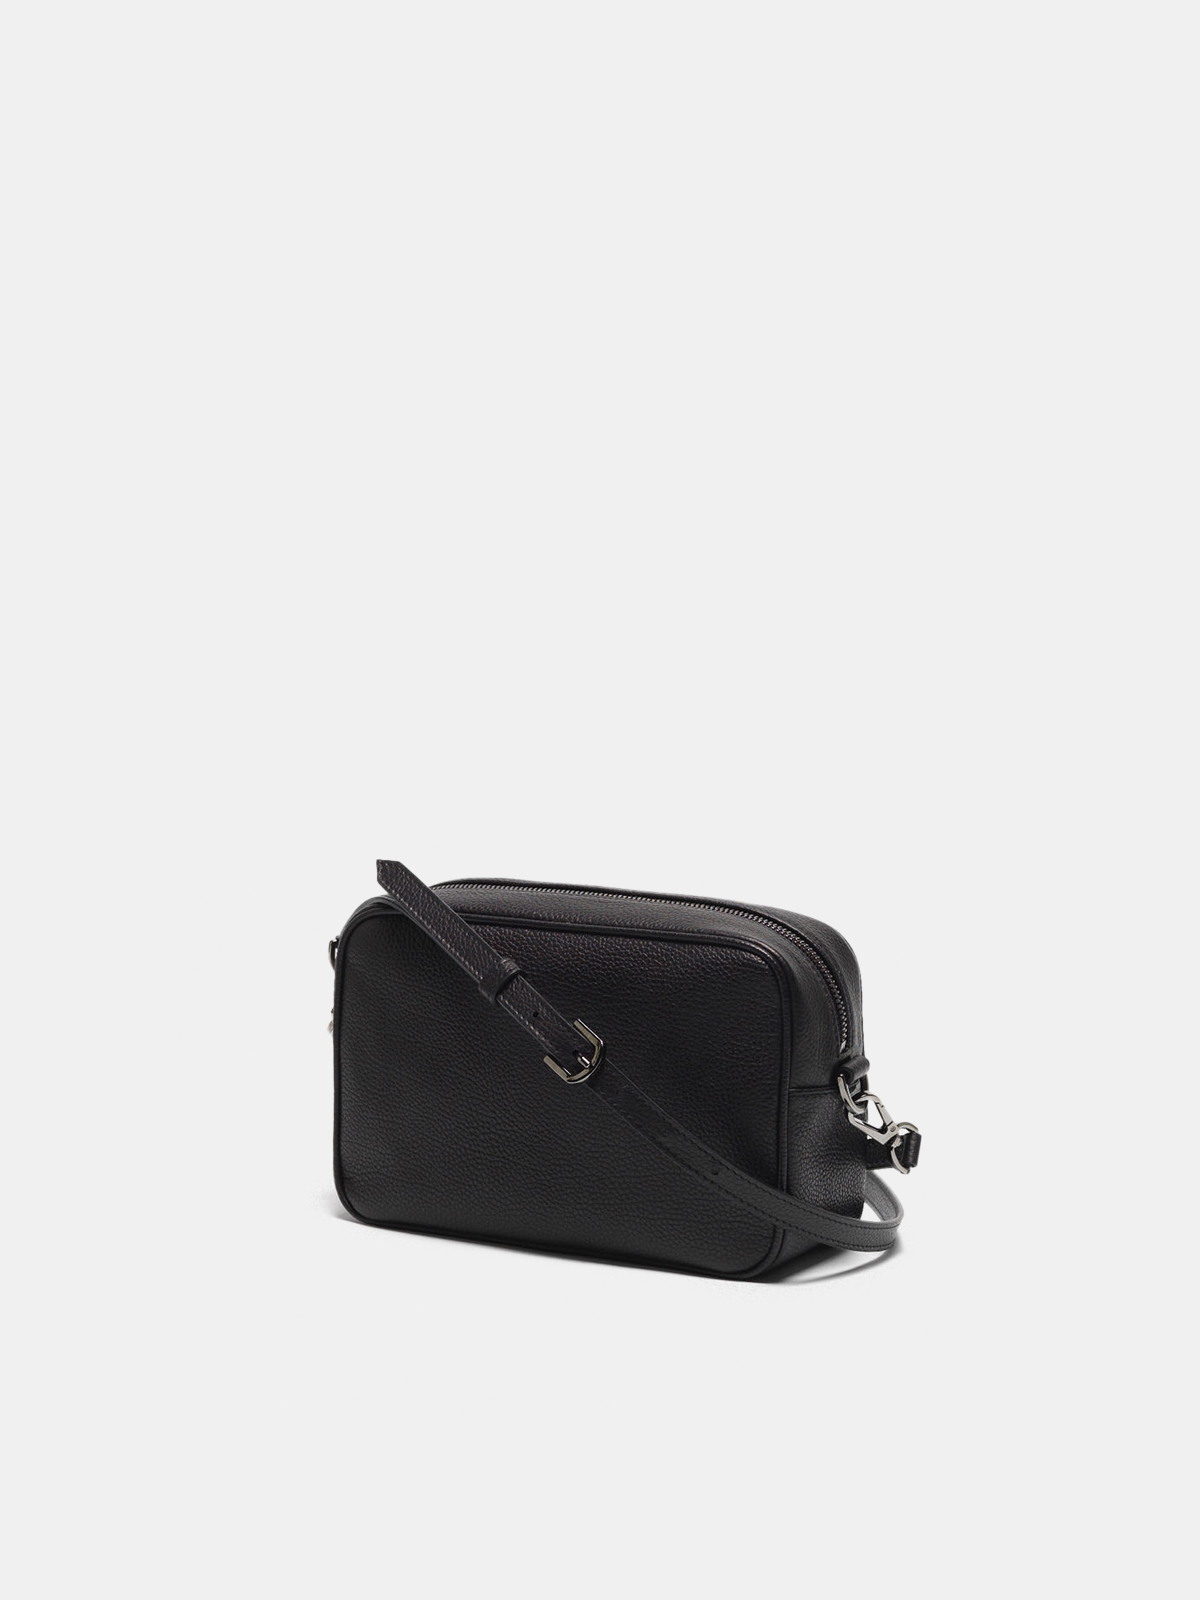 Golden Goose - Star Bag with shoulder strap made of pebbled leather in